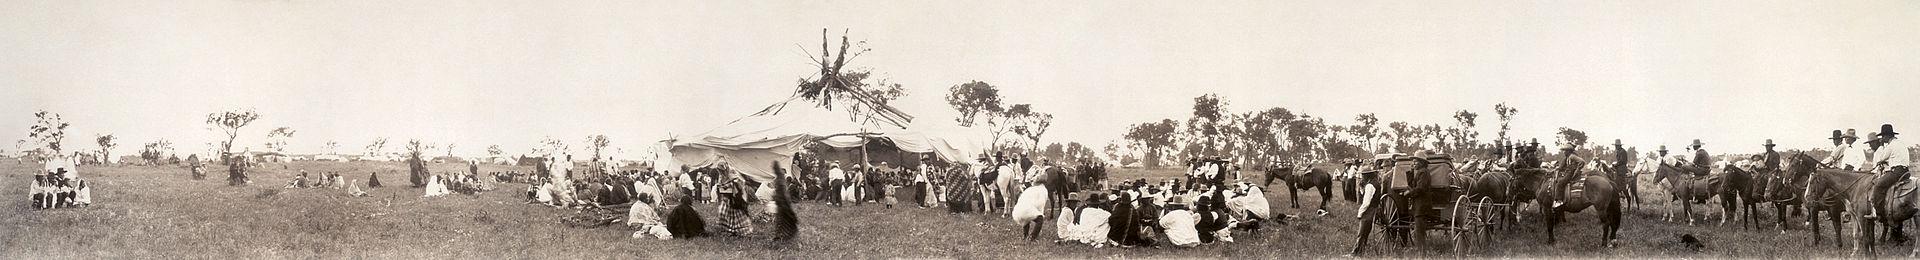 Cheyenne Dance